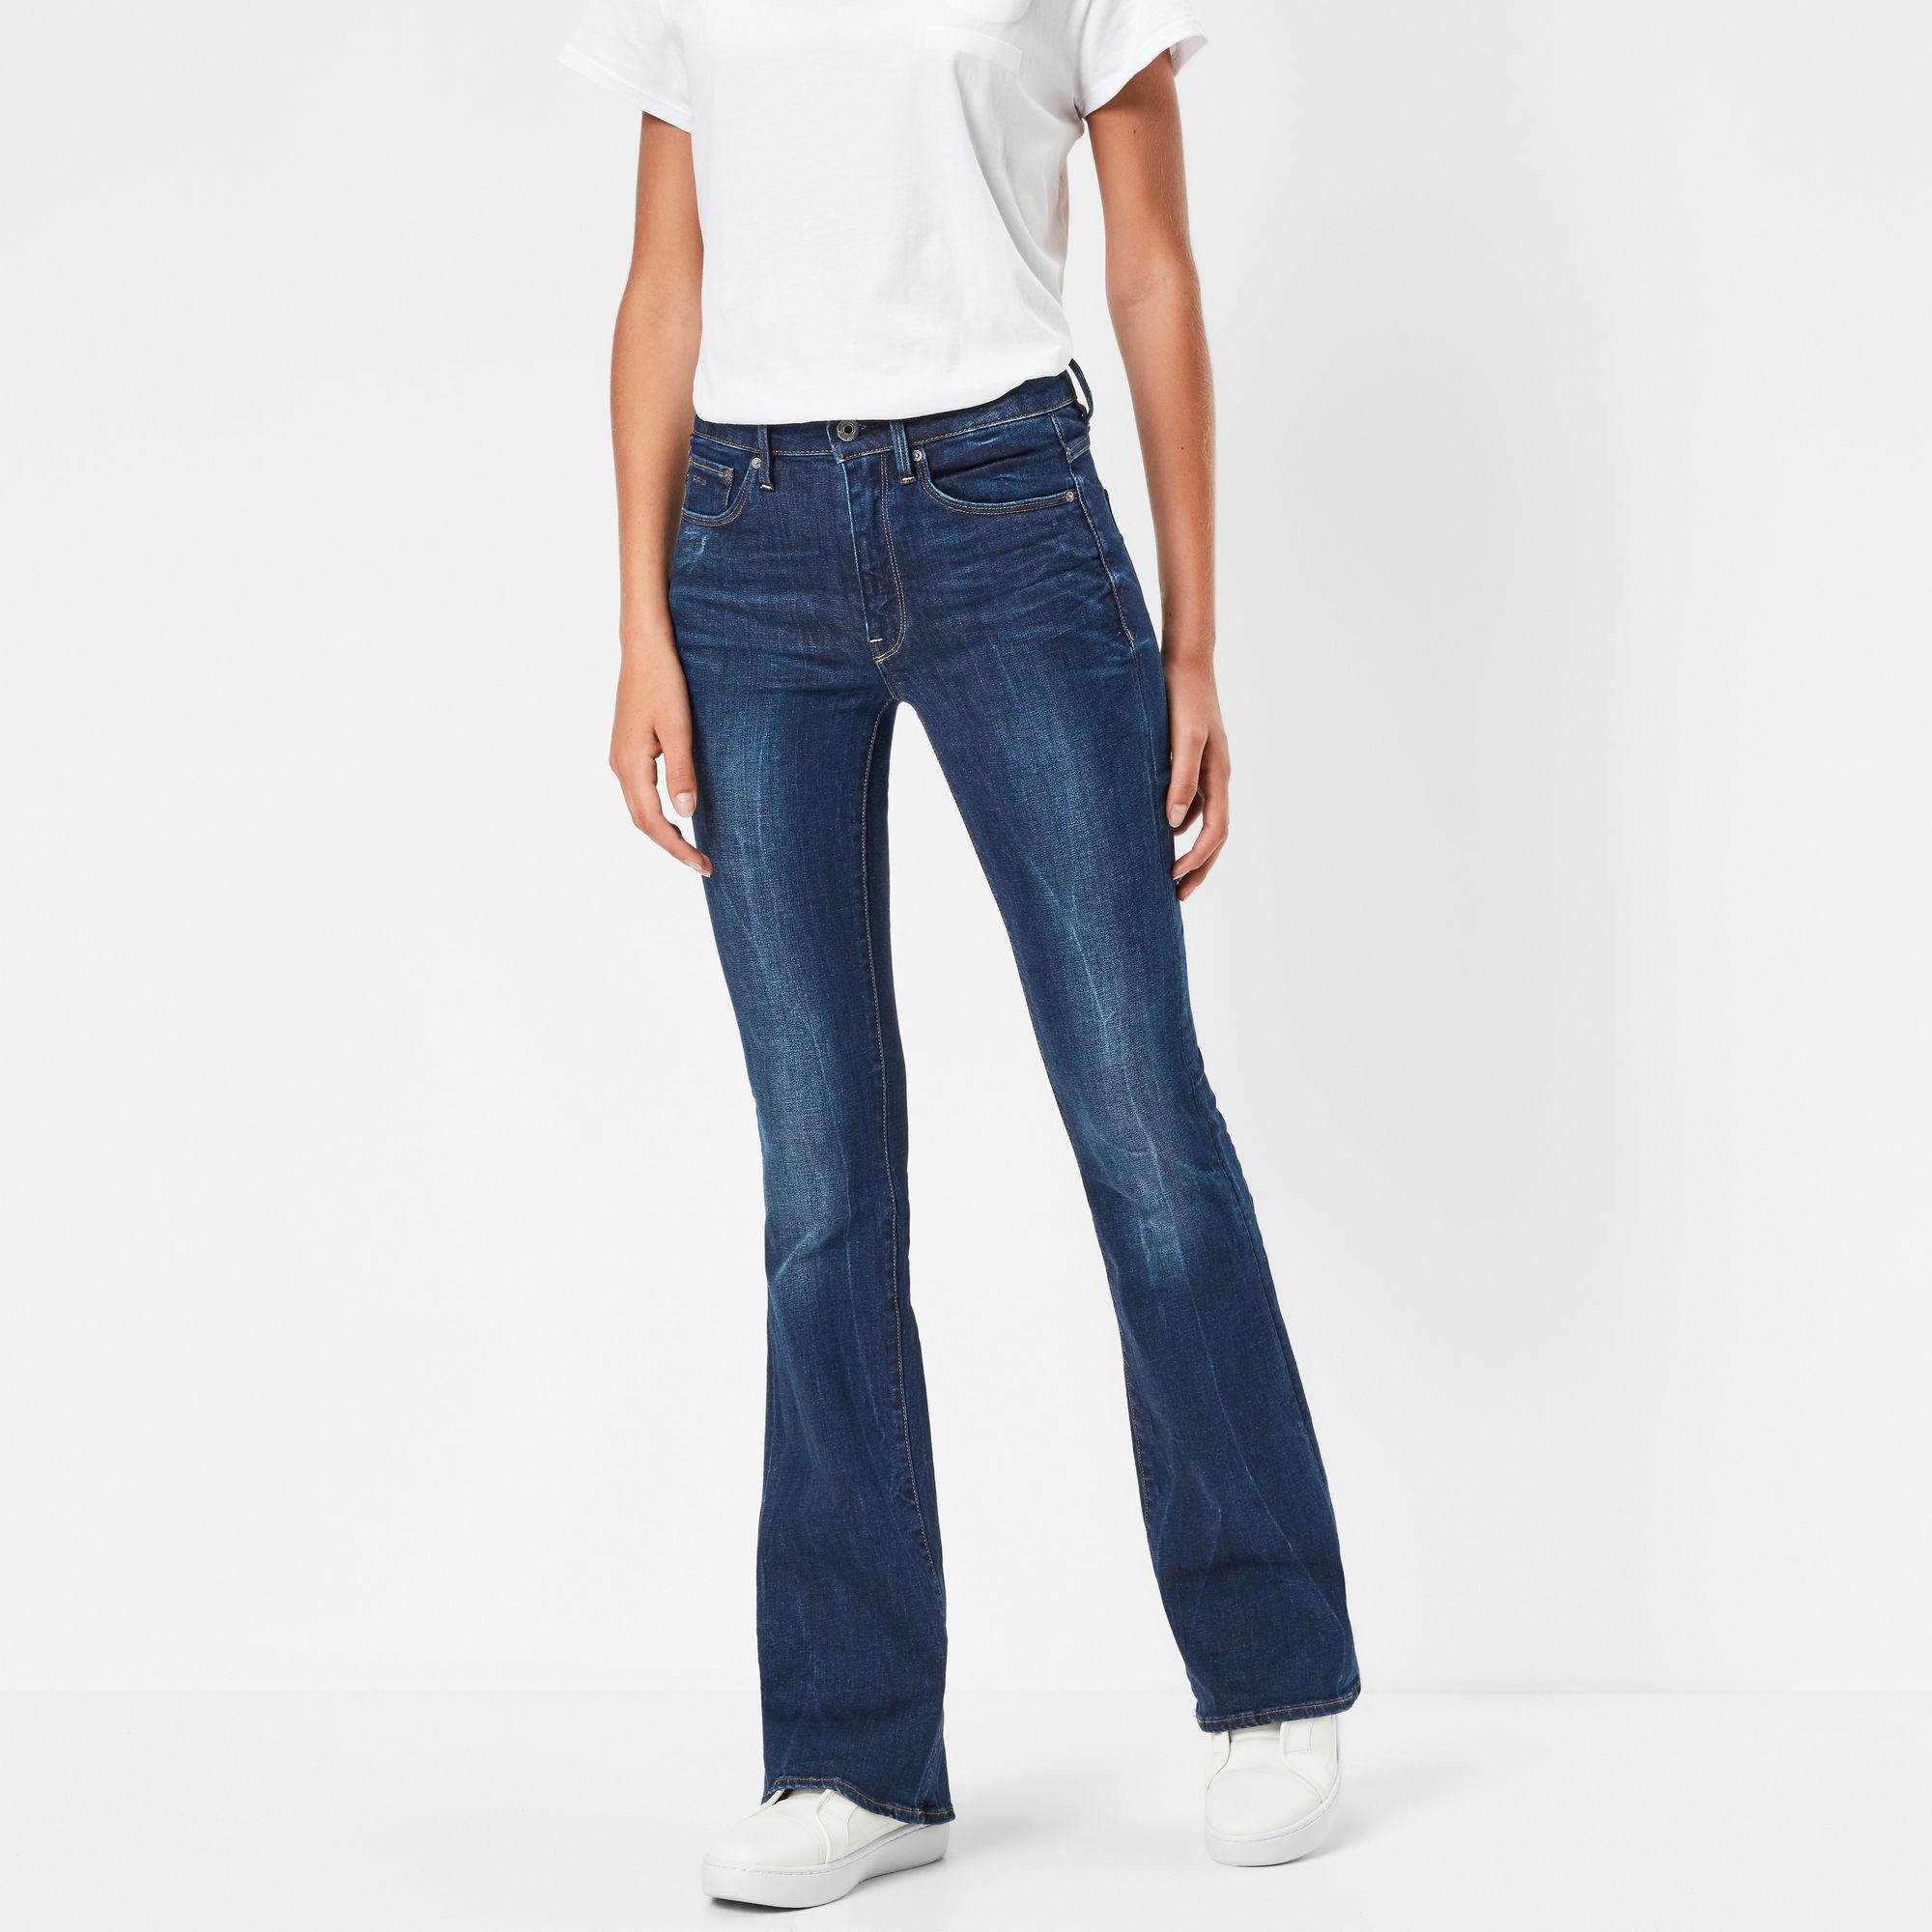 3301 High Waist Flare Jeans